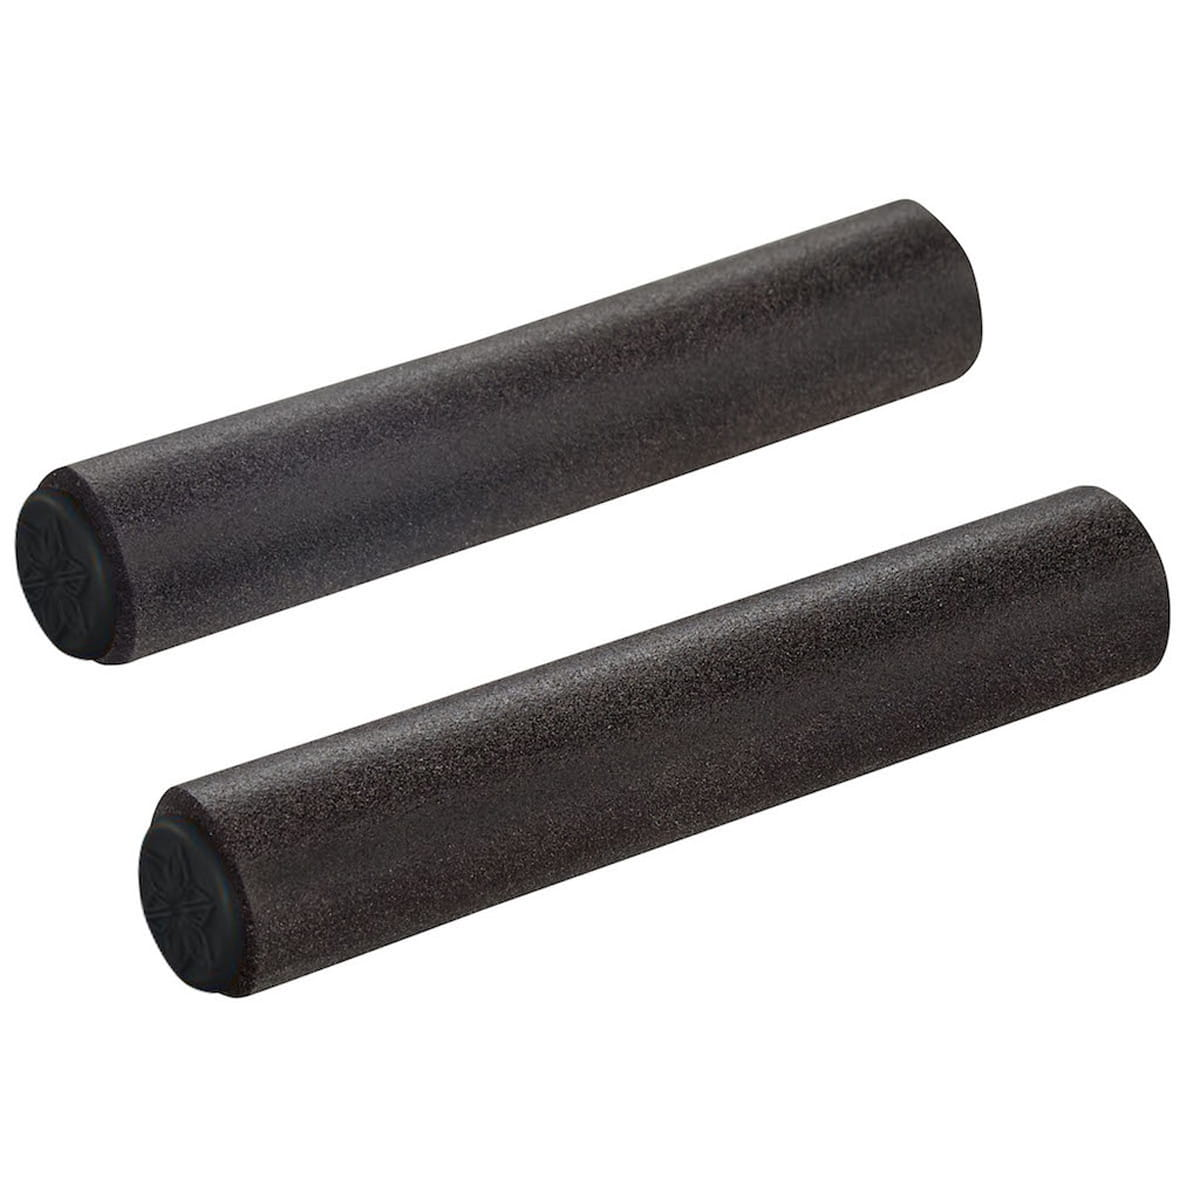 Fabric Silicone Grips Fahrrad Griffe schwarz